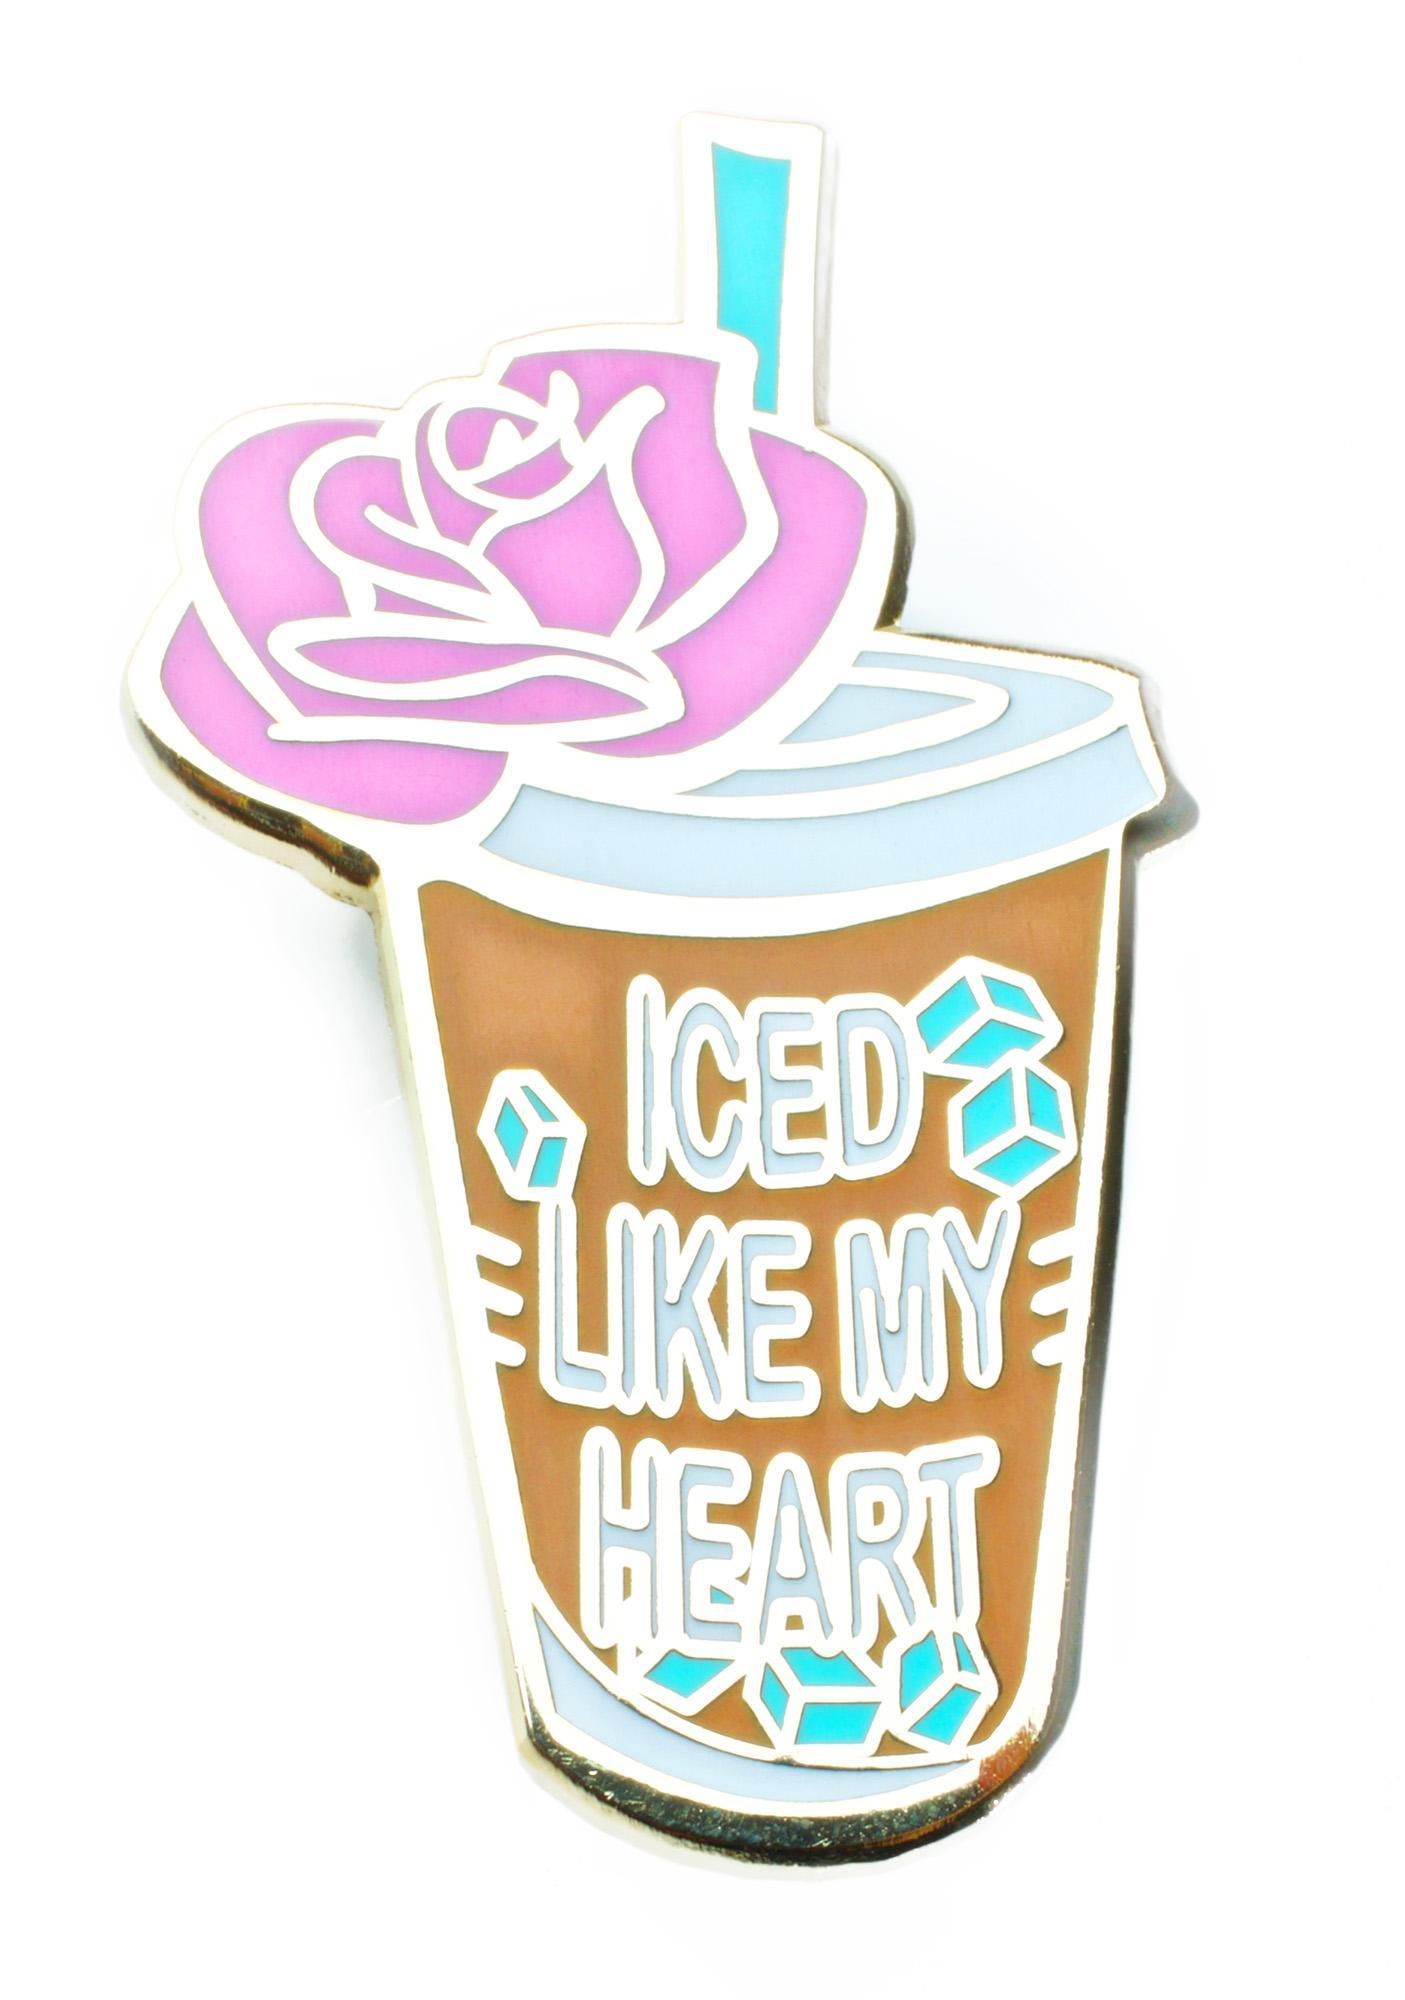 SugarLuxeShop Iced Like My Heart Pin